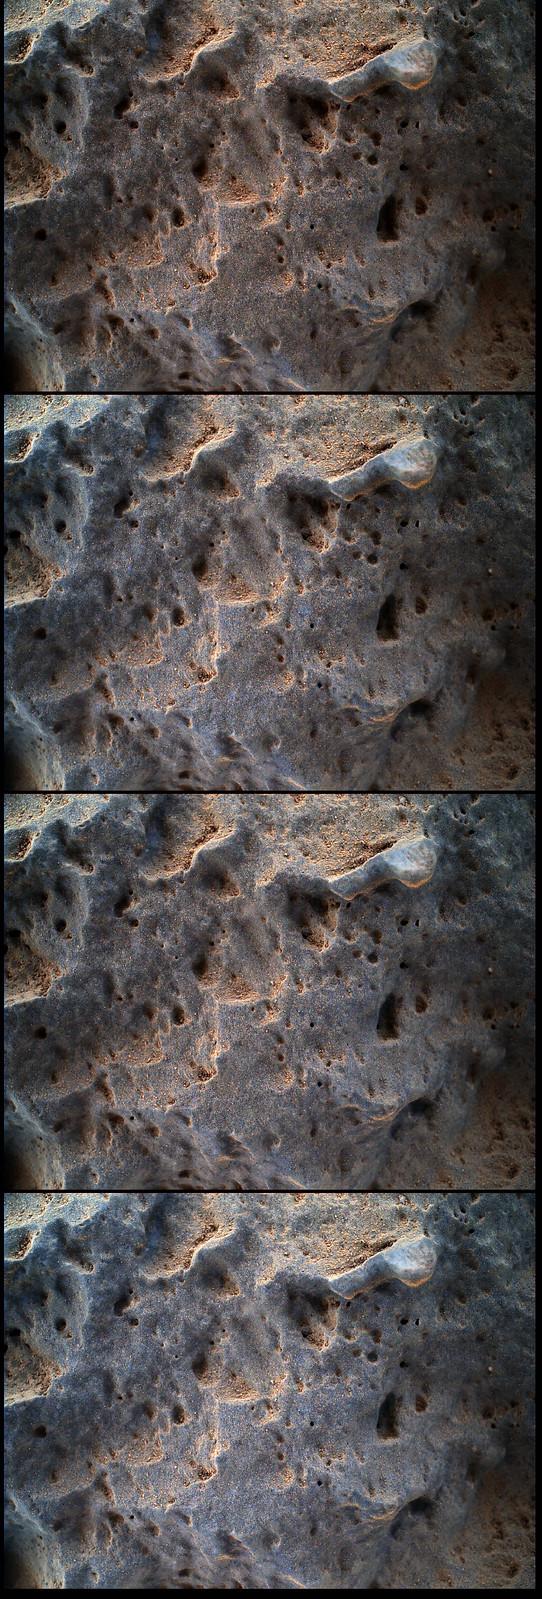 CURIOSITY sol 47 MAHLI